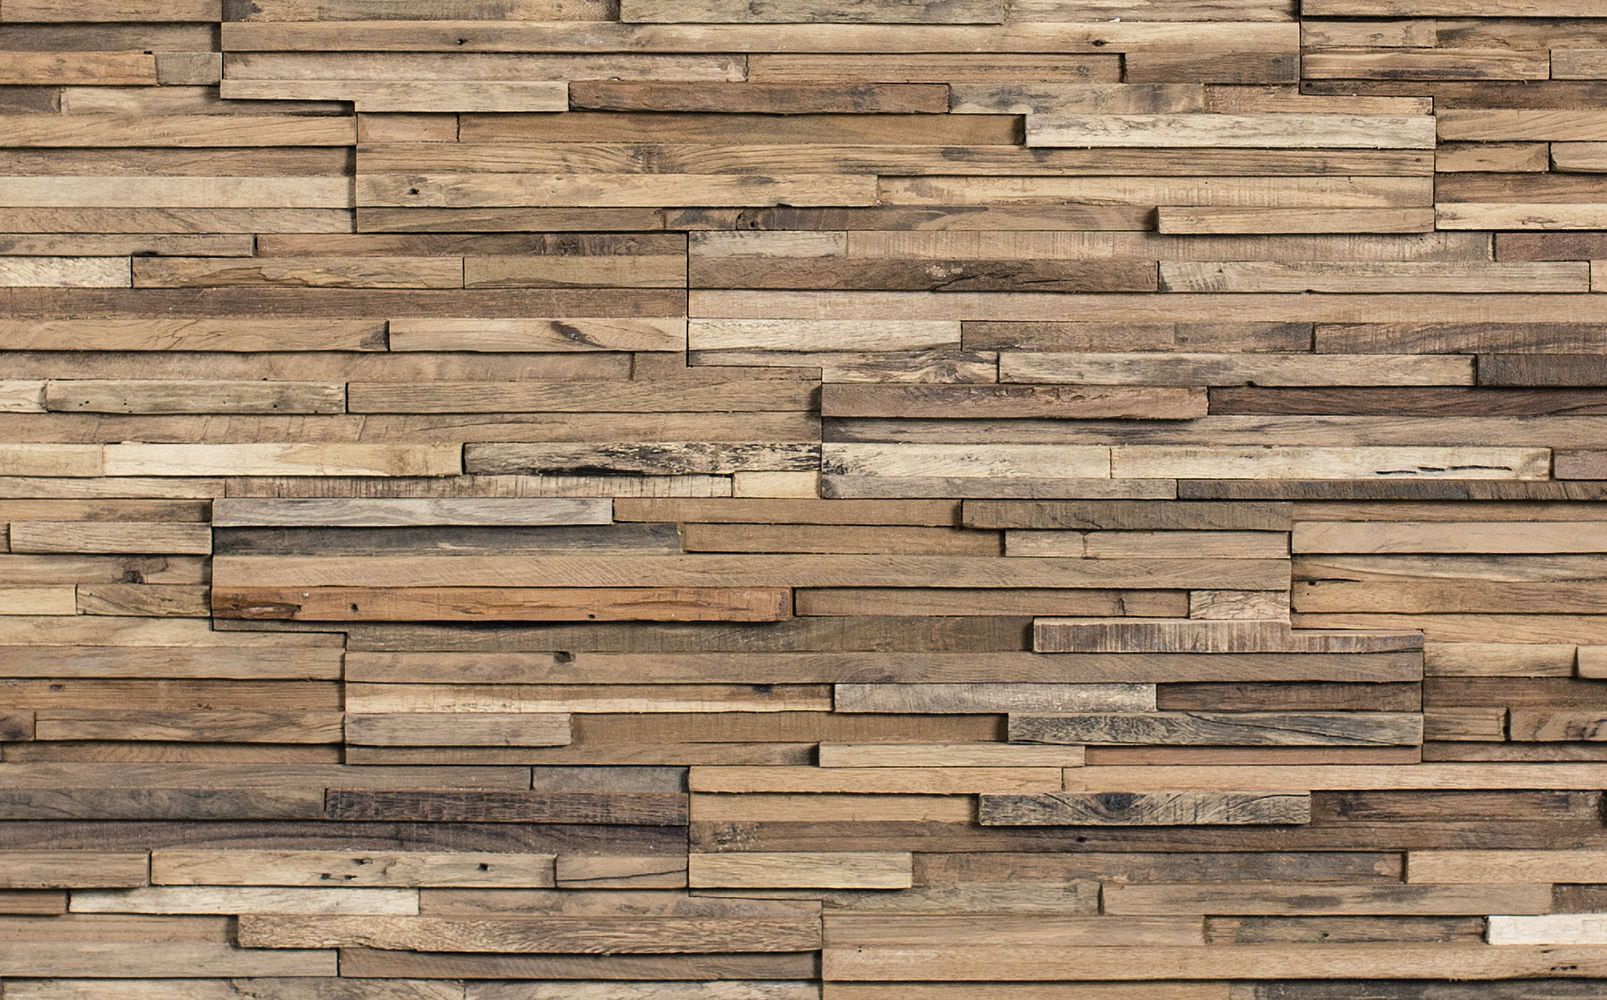 wooden decorative wall panels photo - 5